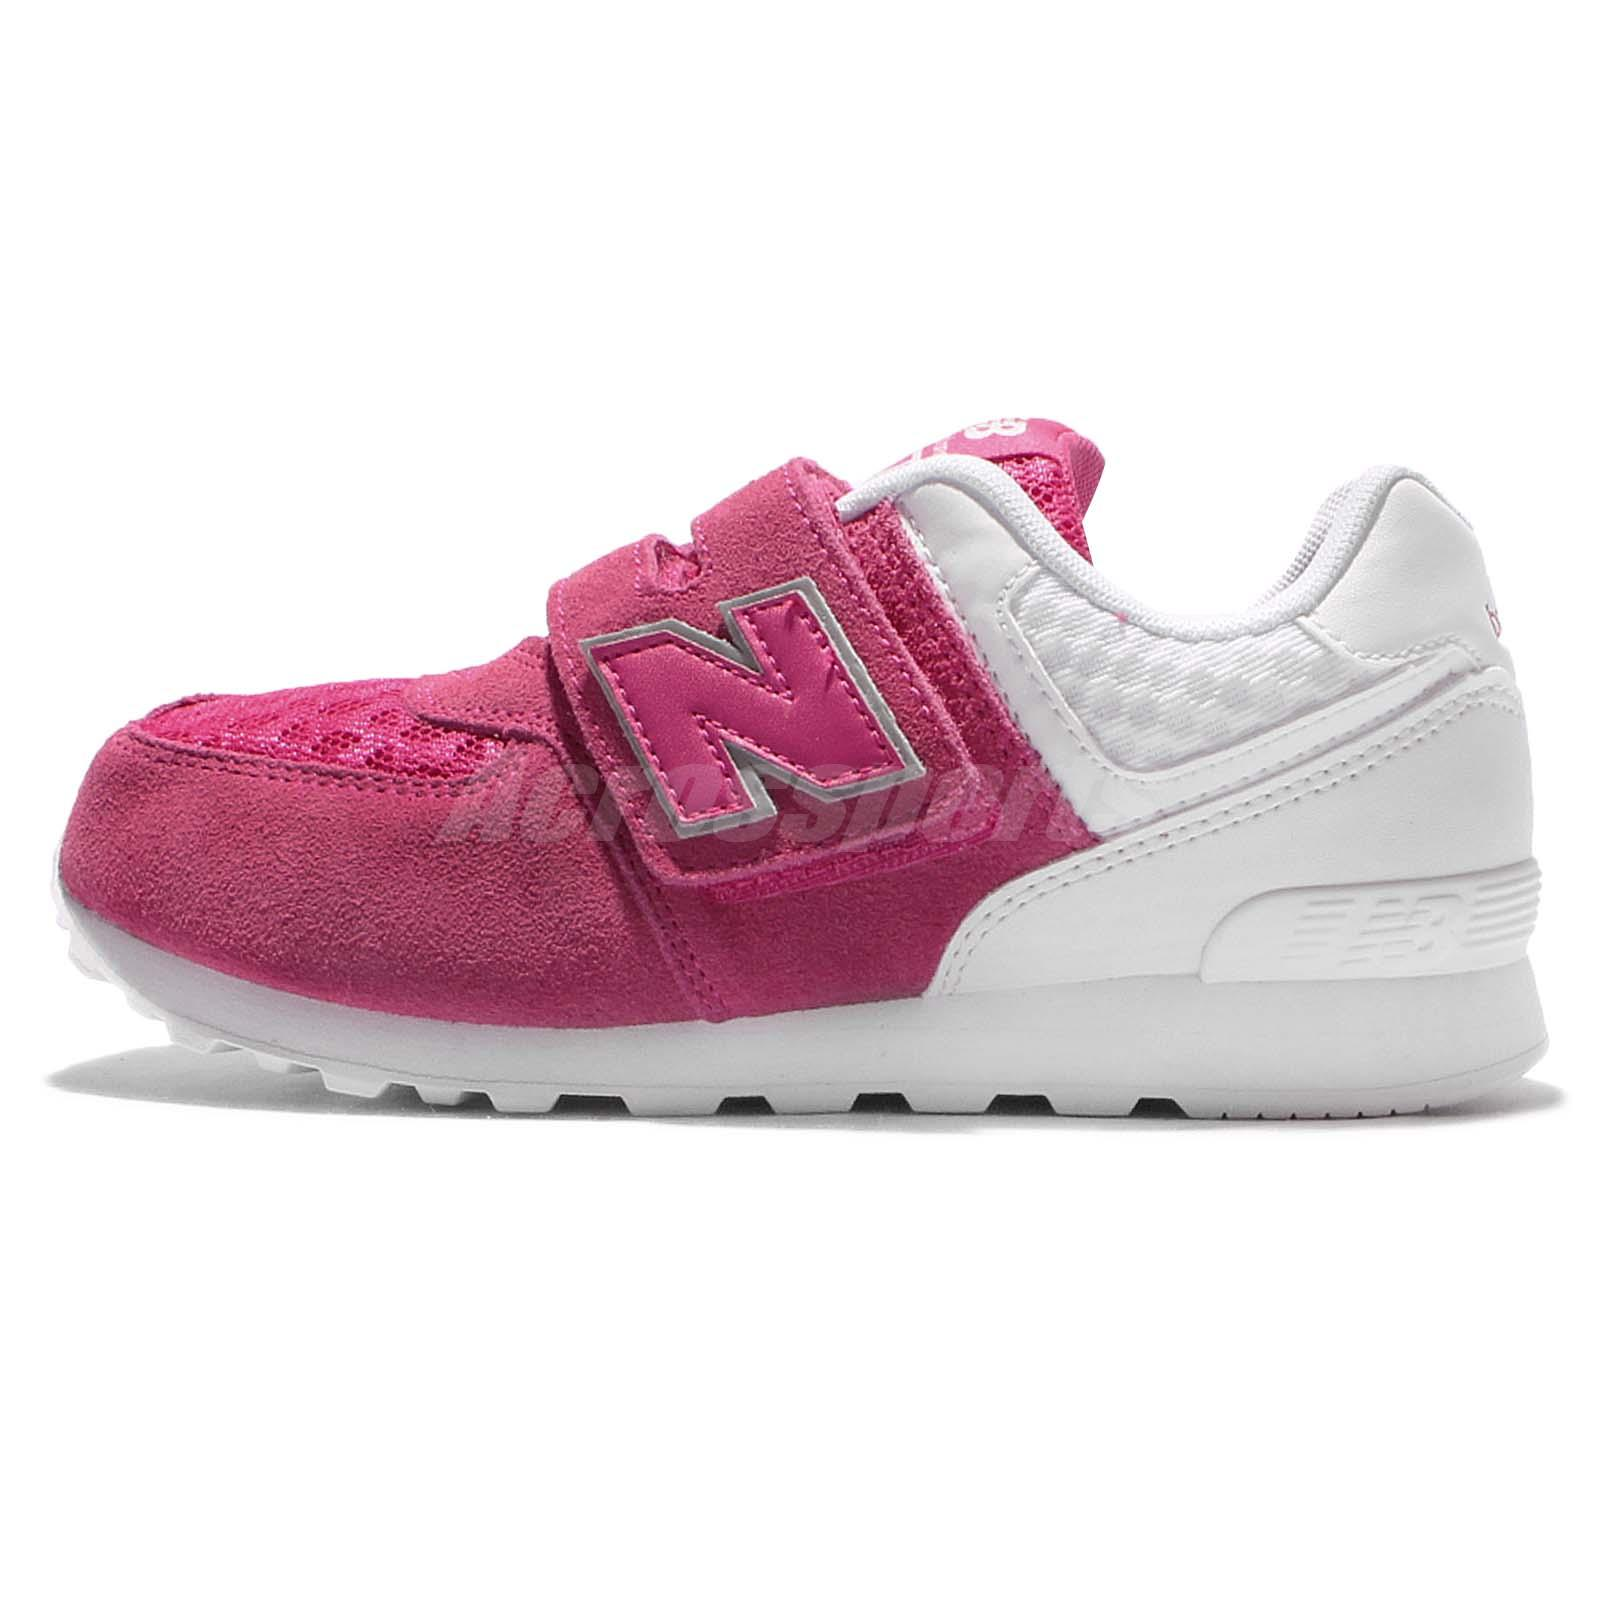 new balance kids 574. new balance kv574qpy w wide pink white kid youth running shoes kv574qpyw kids 574